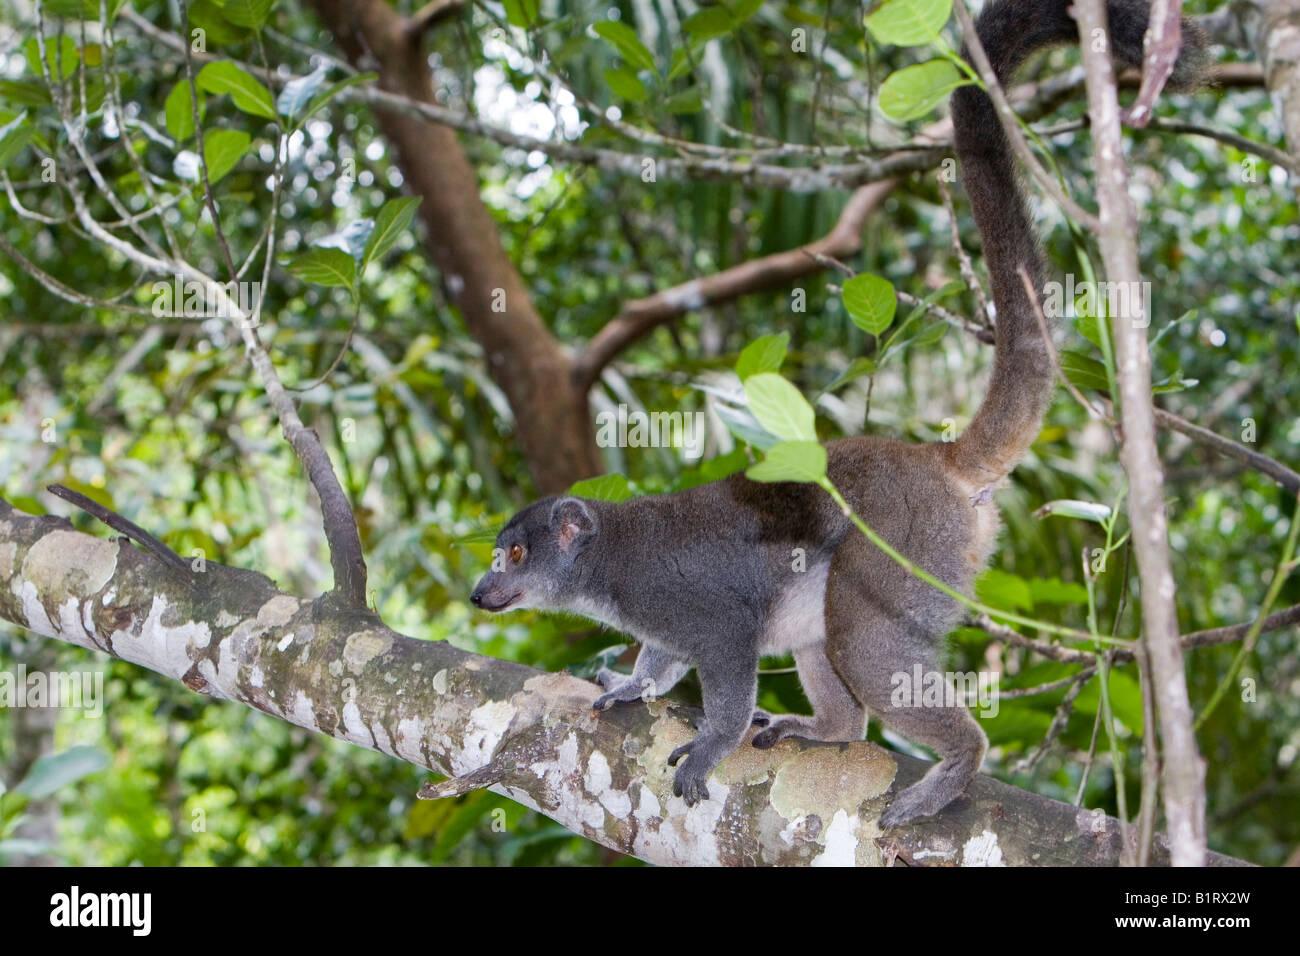 Eastern Lesser Bamboo or Gray Gentle Lemur (Hapalemur griseus), Madagascar, Africa - Stock Image